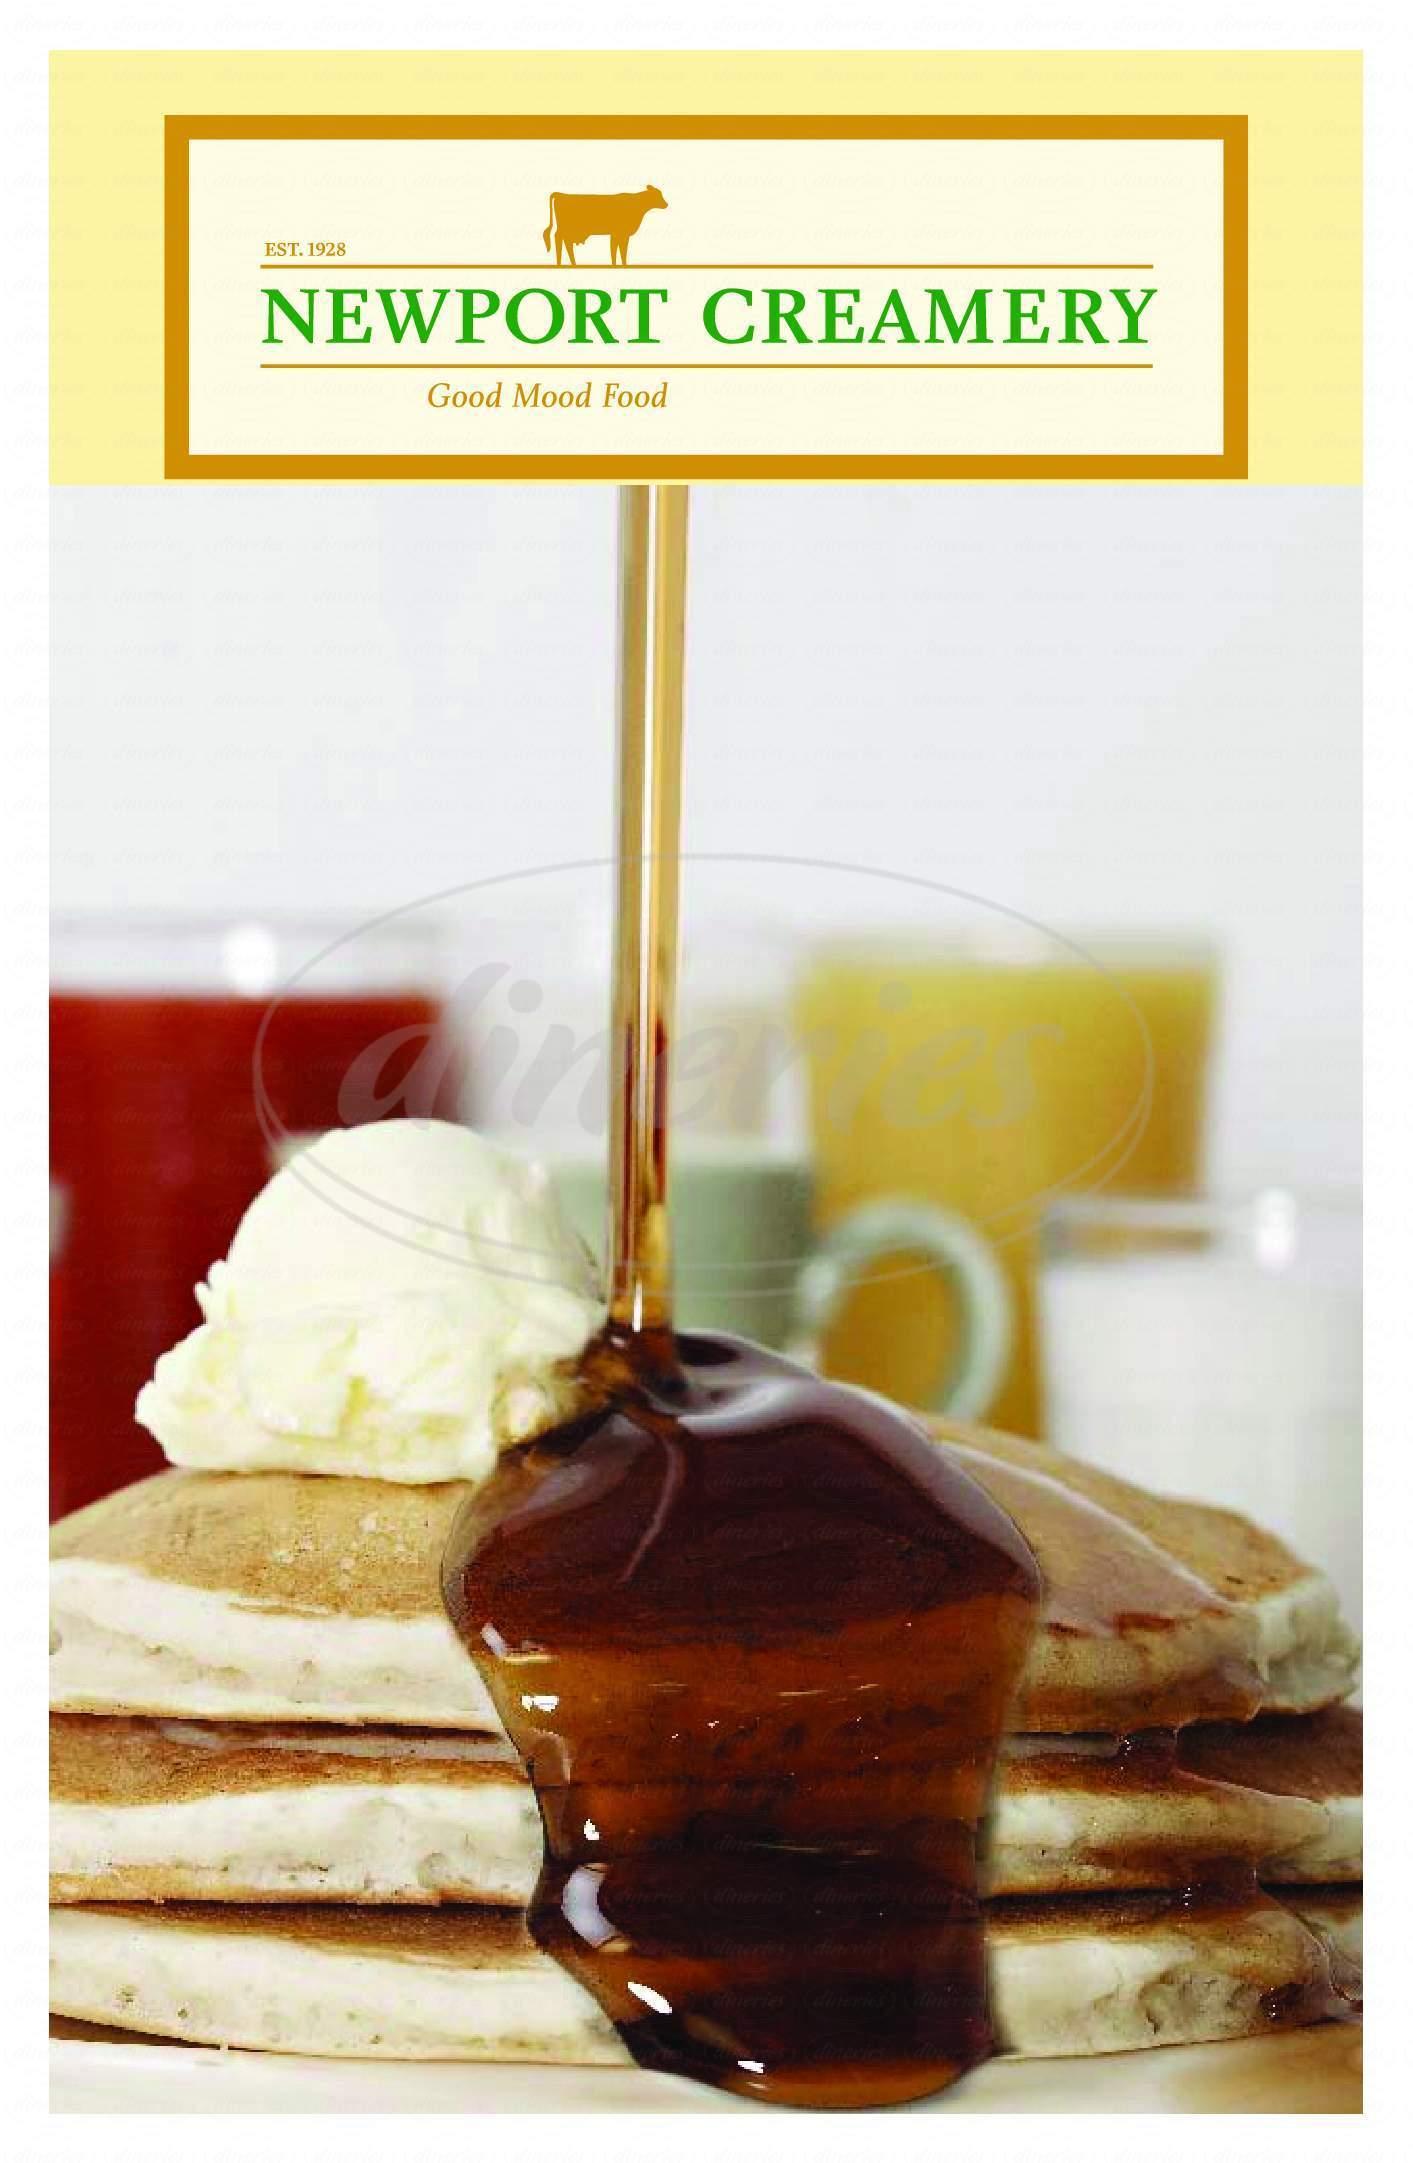 menu for Newport Creamery